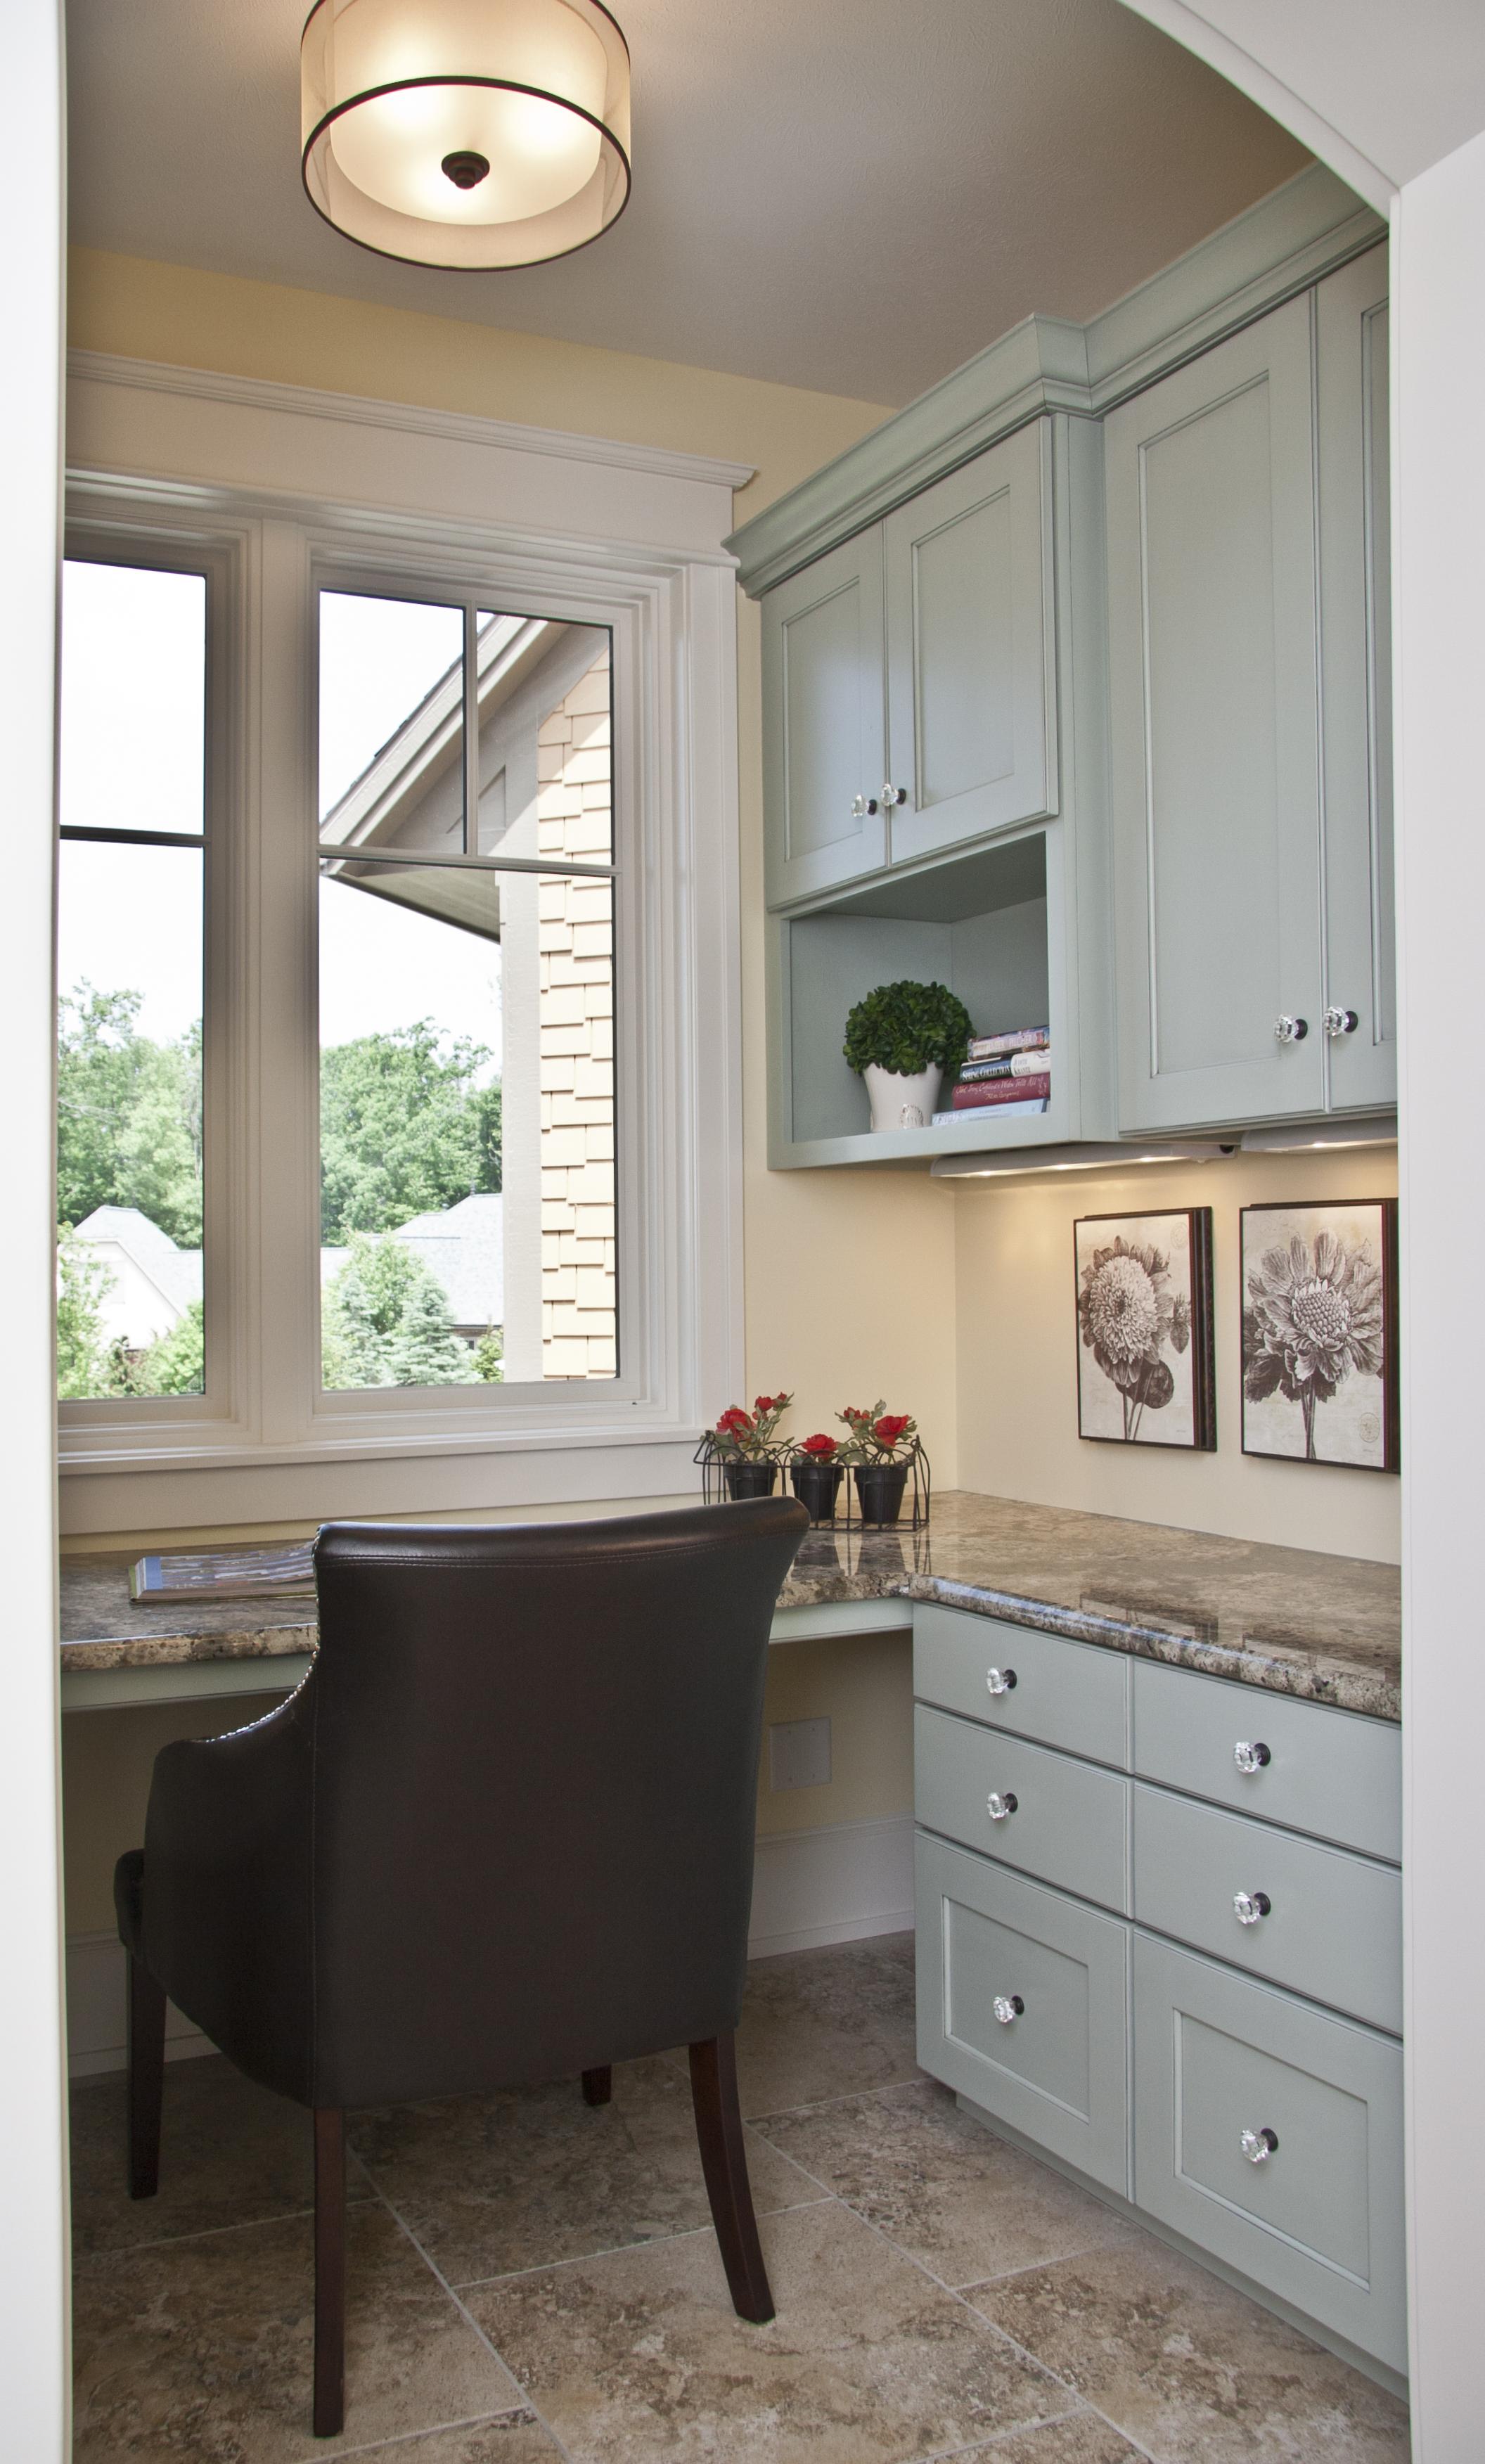 home planning_IMG_0443-1.jpg